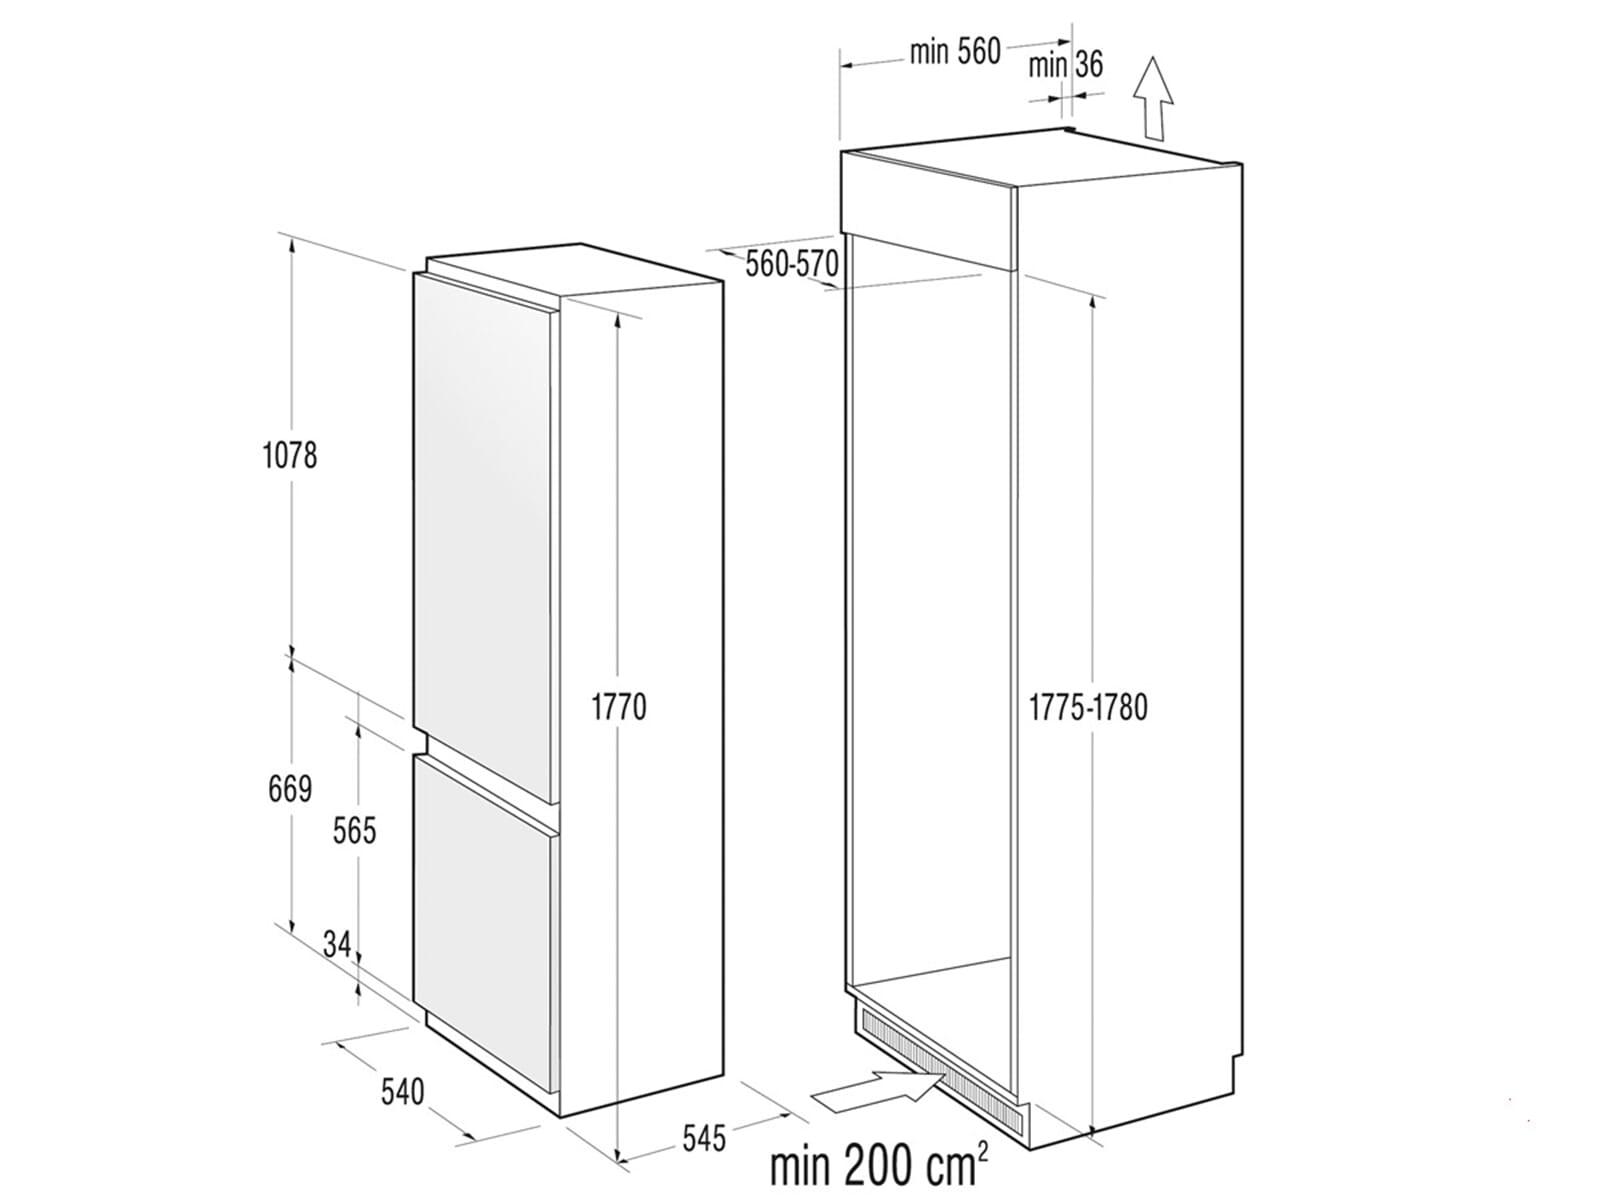 rki4182ew g nstige haushaltsger te. Black Bedroom Furniture Sets. Home Design Ideas